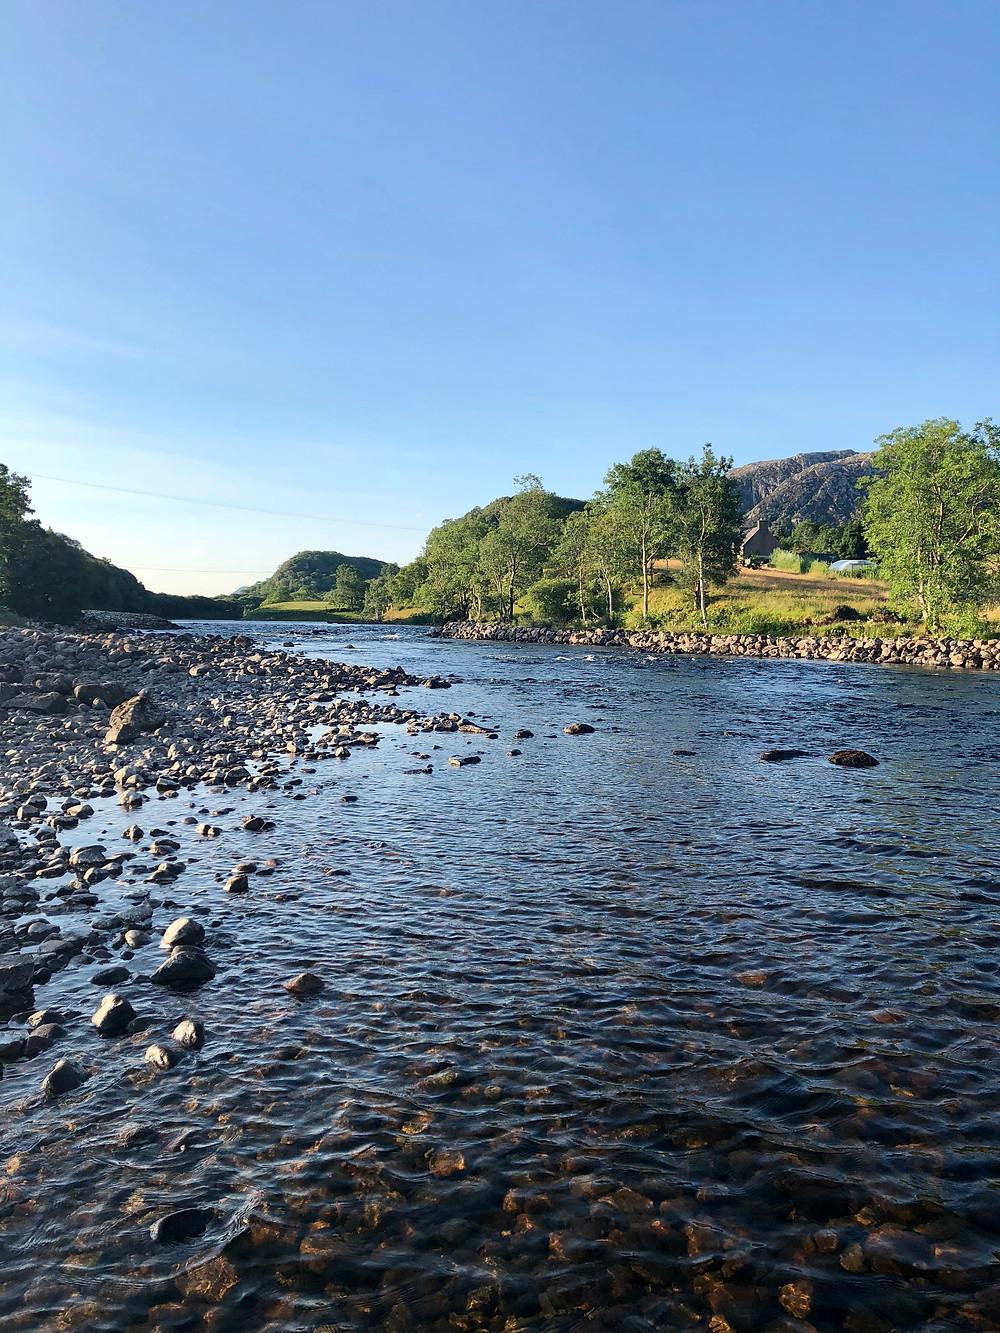 The Tee Pool on the River Ewe